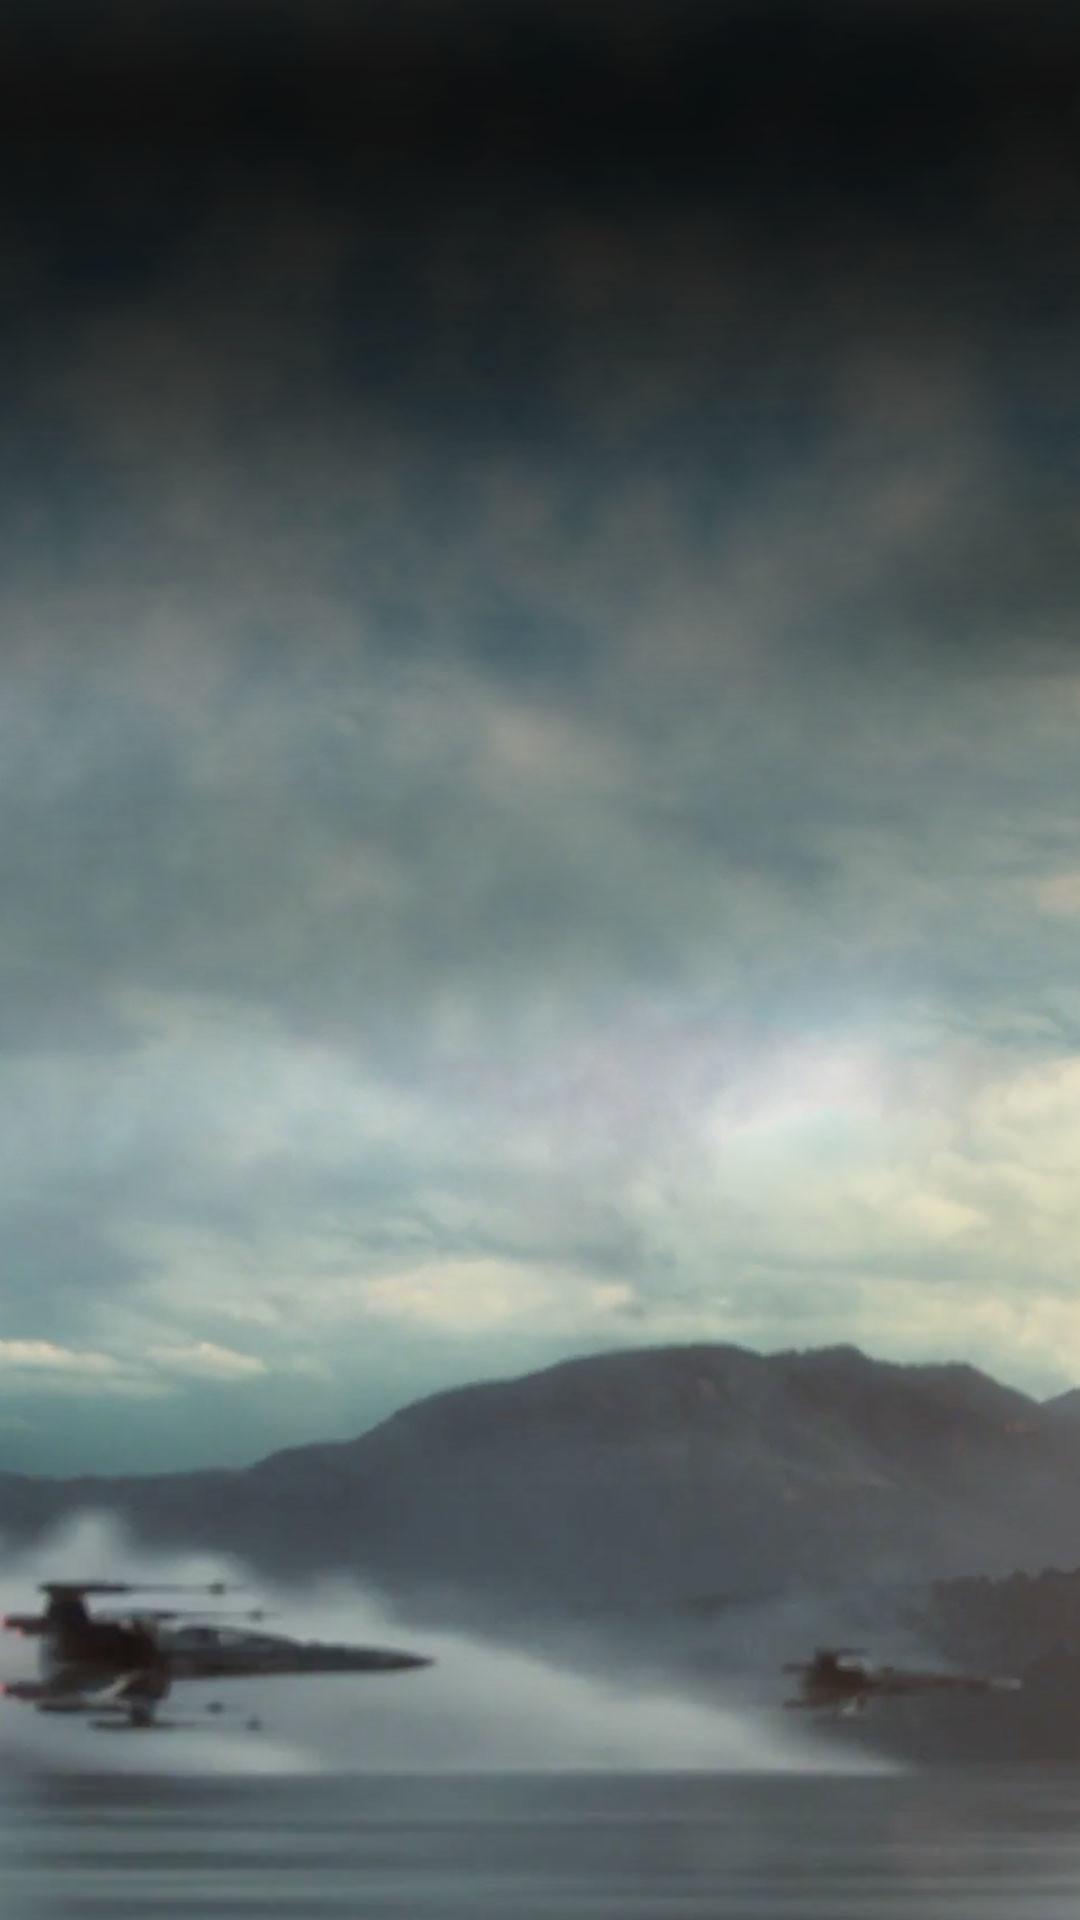 … Force Awakens Wallpaper iDownloadBlog X Wings. Download: iPhone